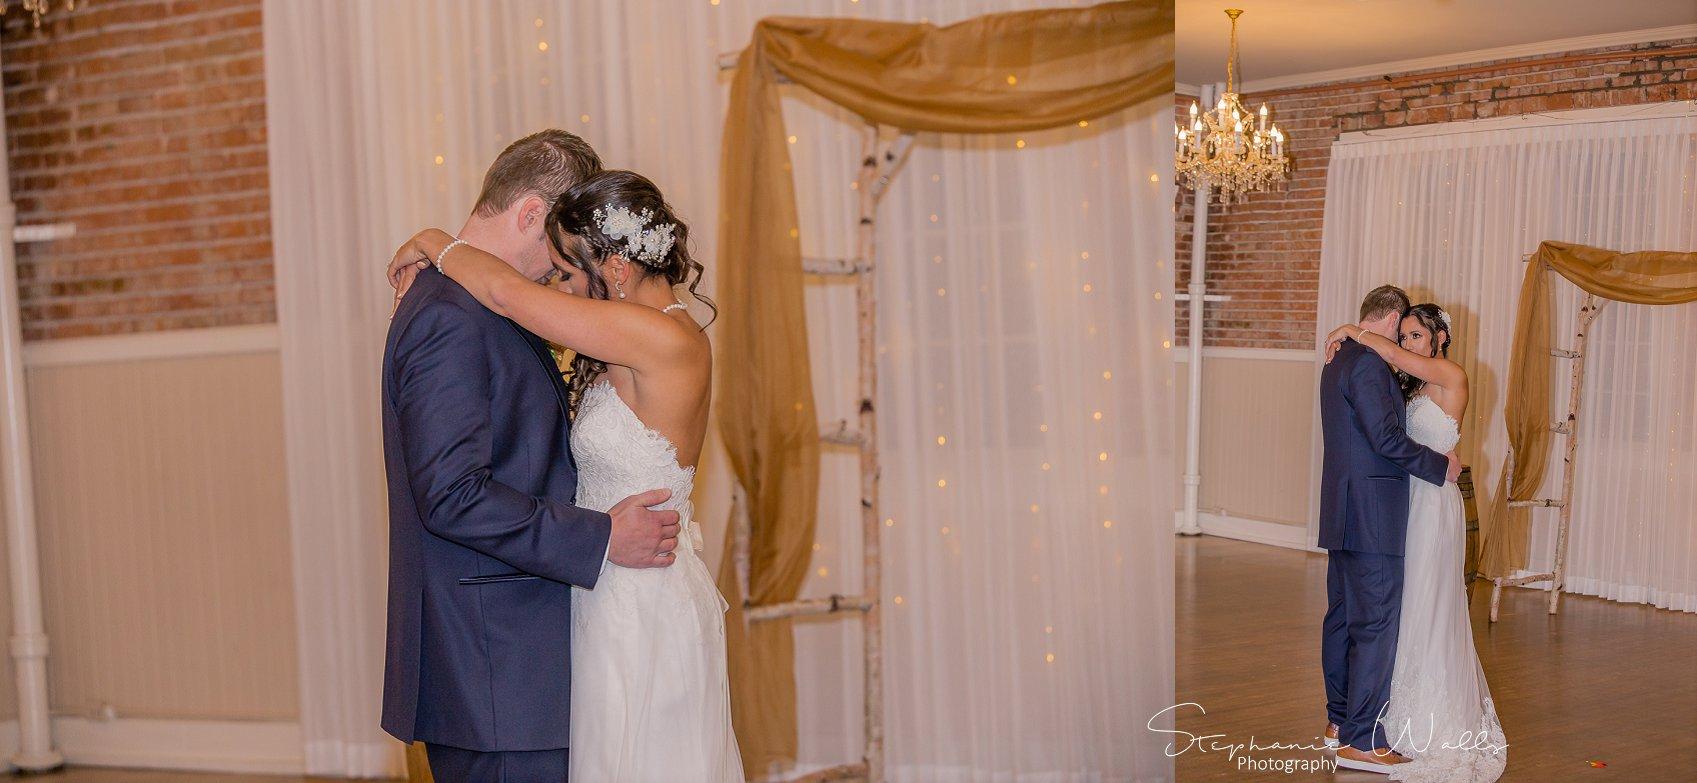 1st Dance Dancing 021 KK & Zack   Hollywood Schoolhouse Wedding   Woodinville, Wa Wedding Photographer